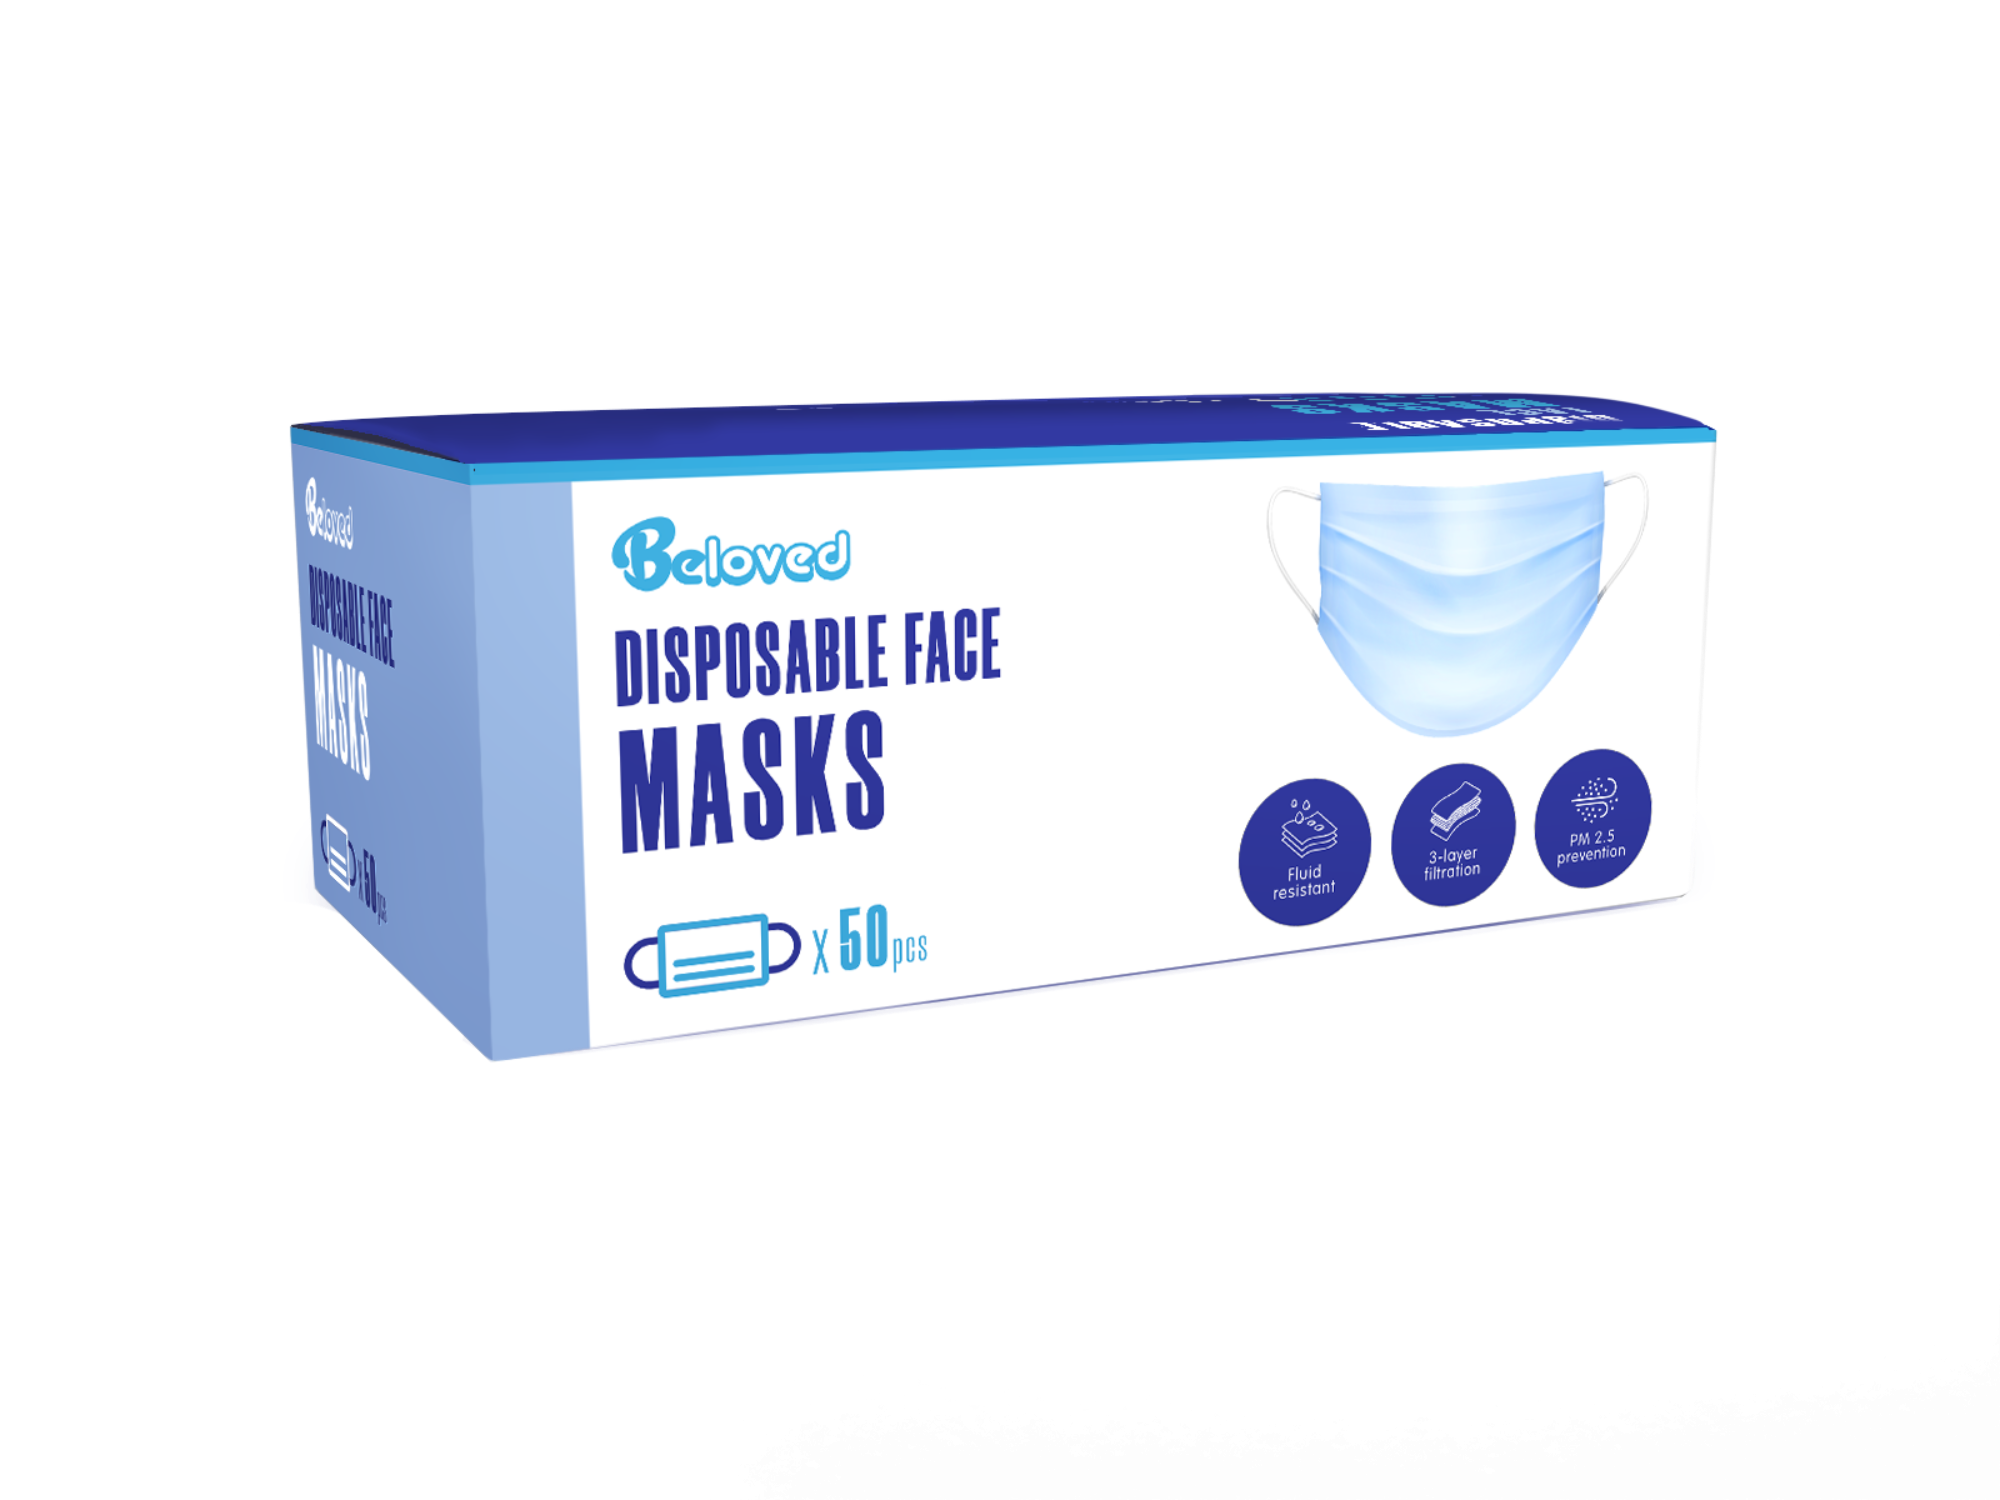 masks%2050%20box%20%E5%B7%A6%E8%A7%86%E8.png